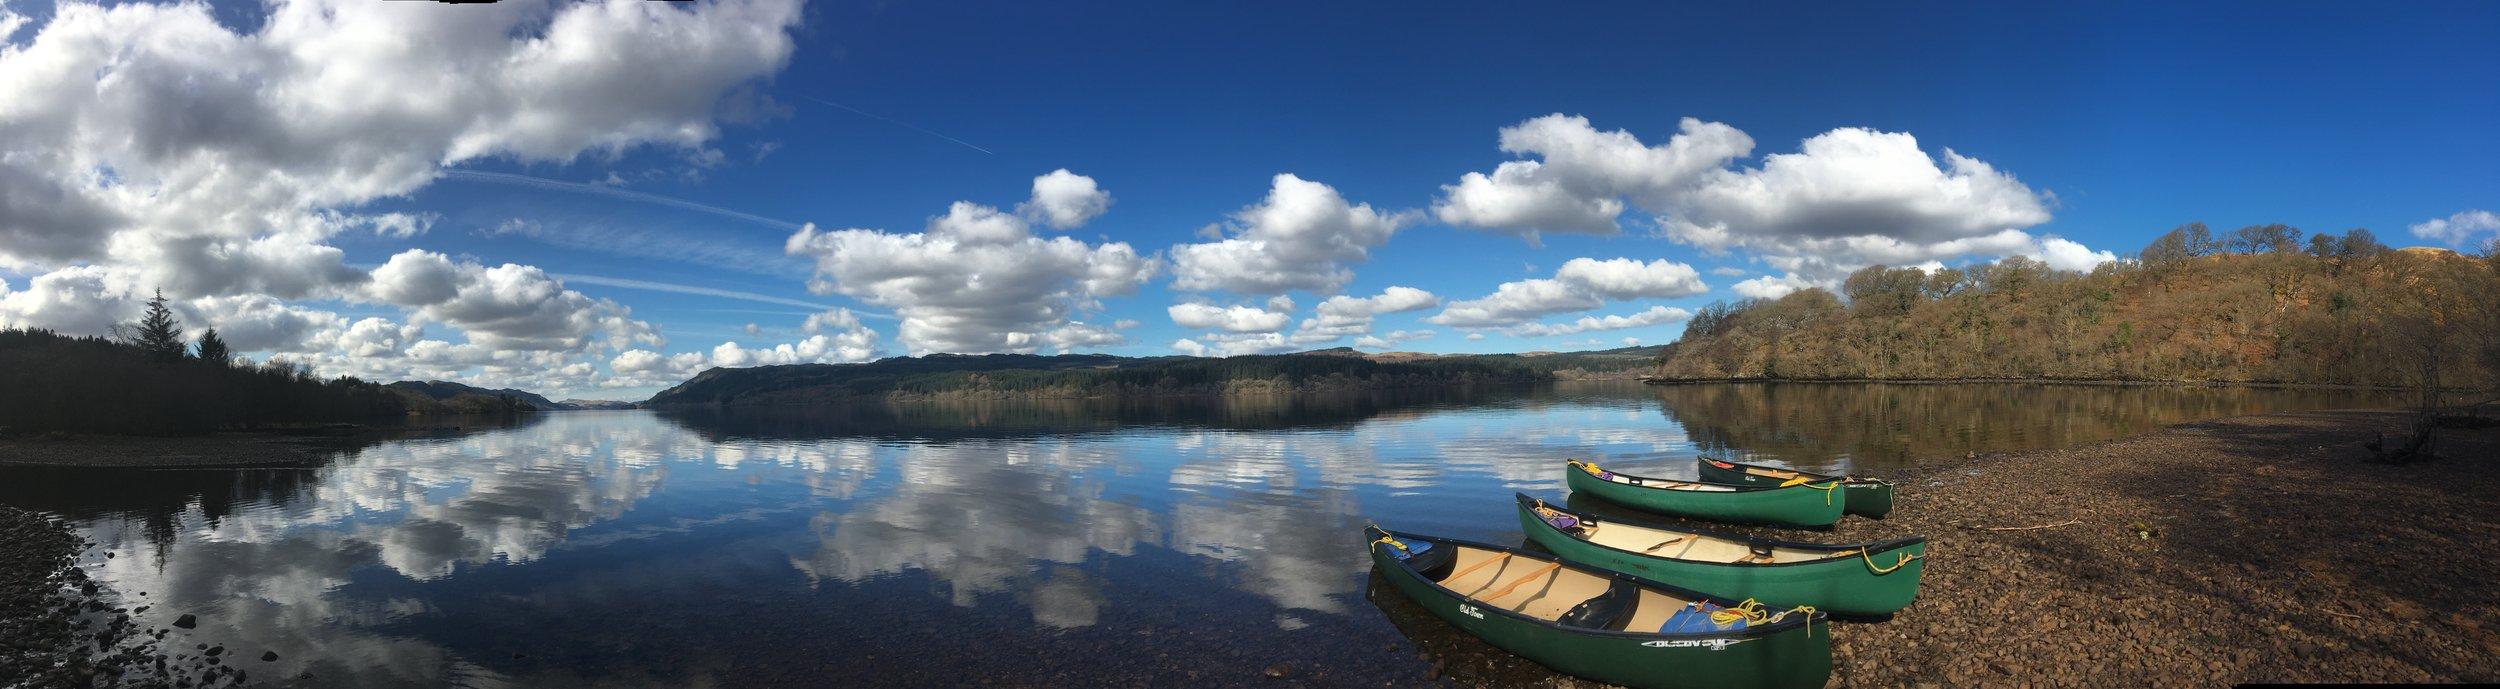 canoe panorama bushcraft trip